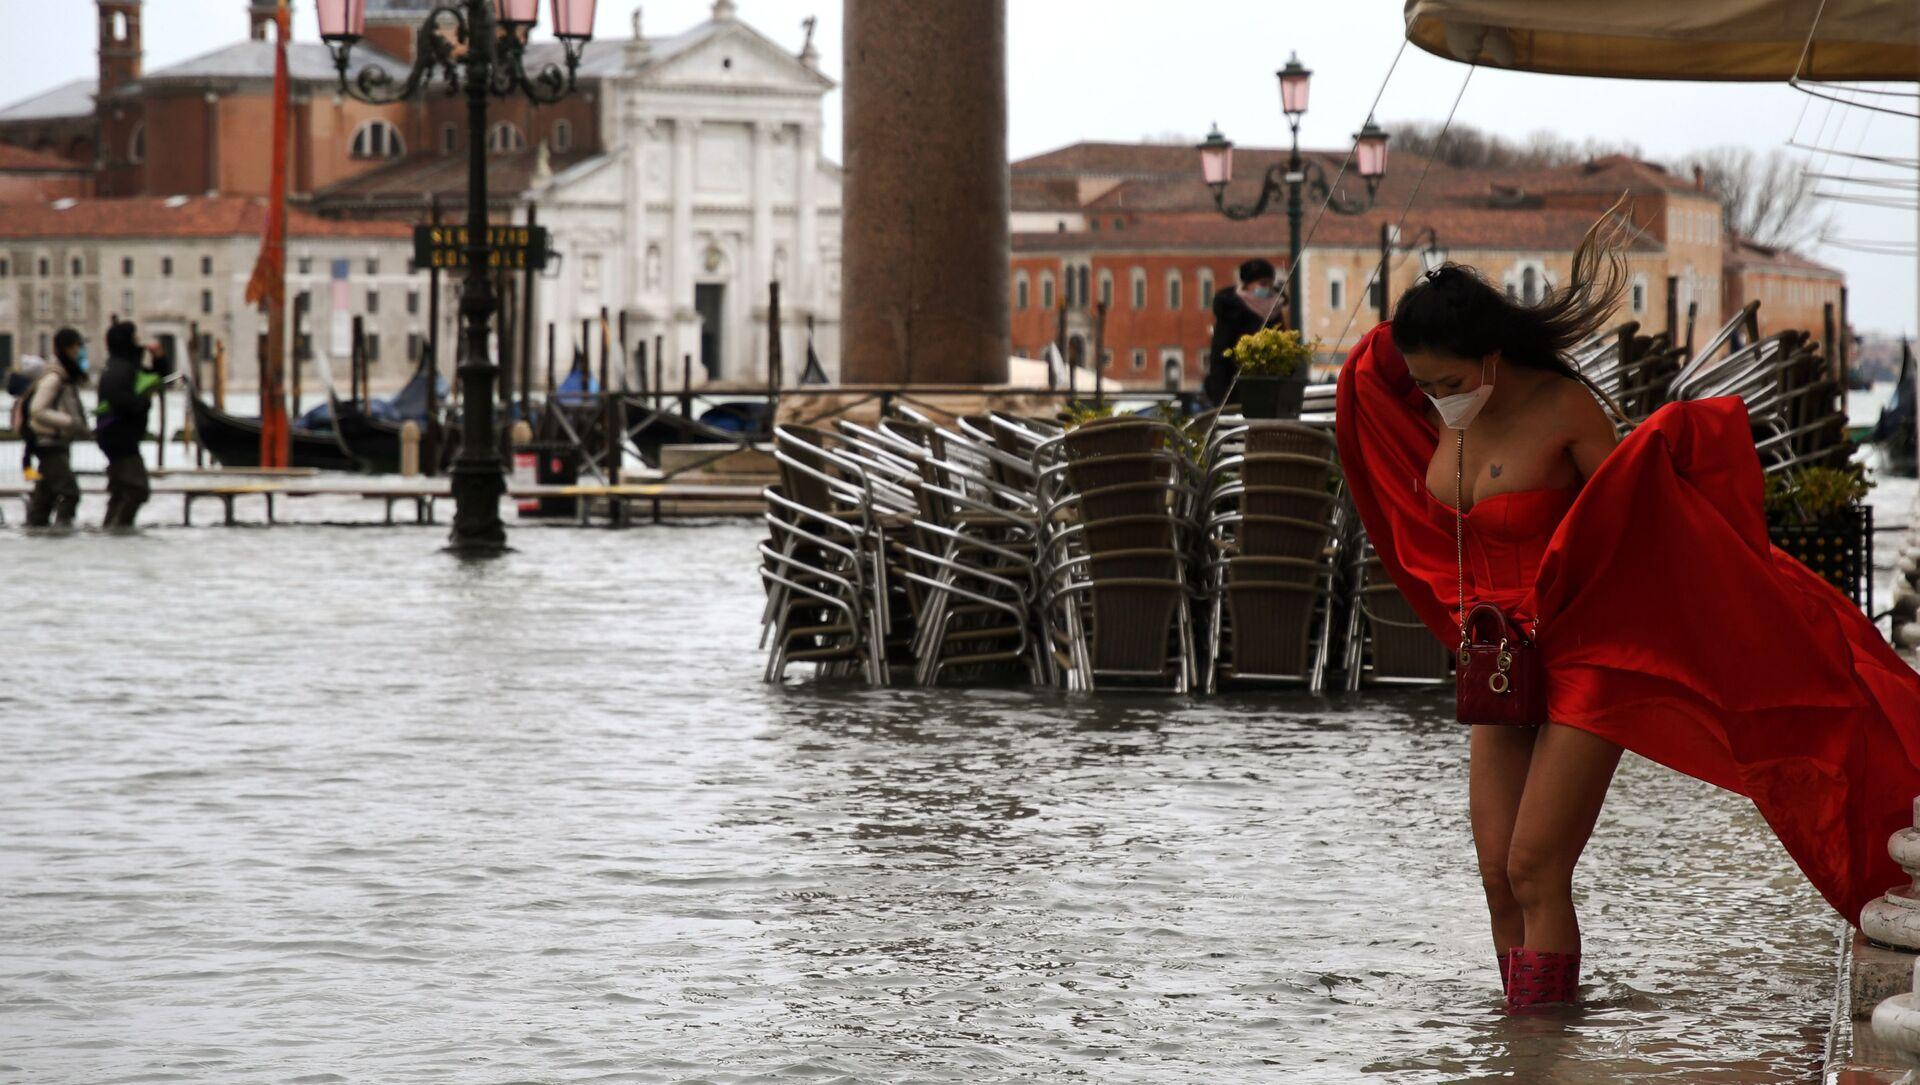 Venecia vuelve a desaparecer bajo el agua    - Sputnik Mundo, 1920, 09.12.2020